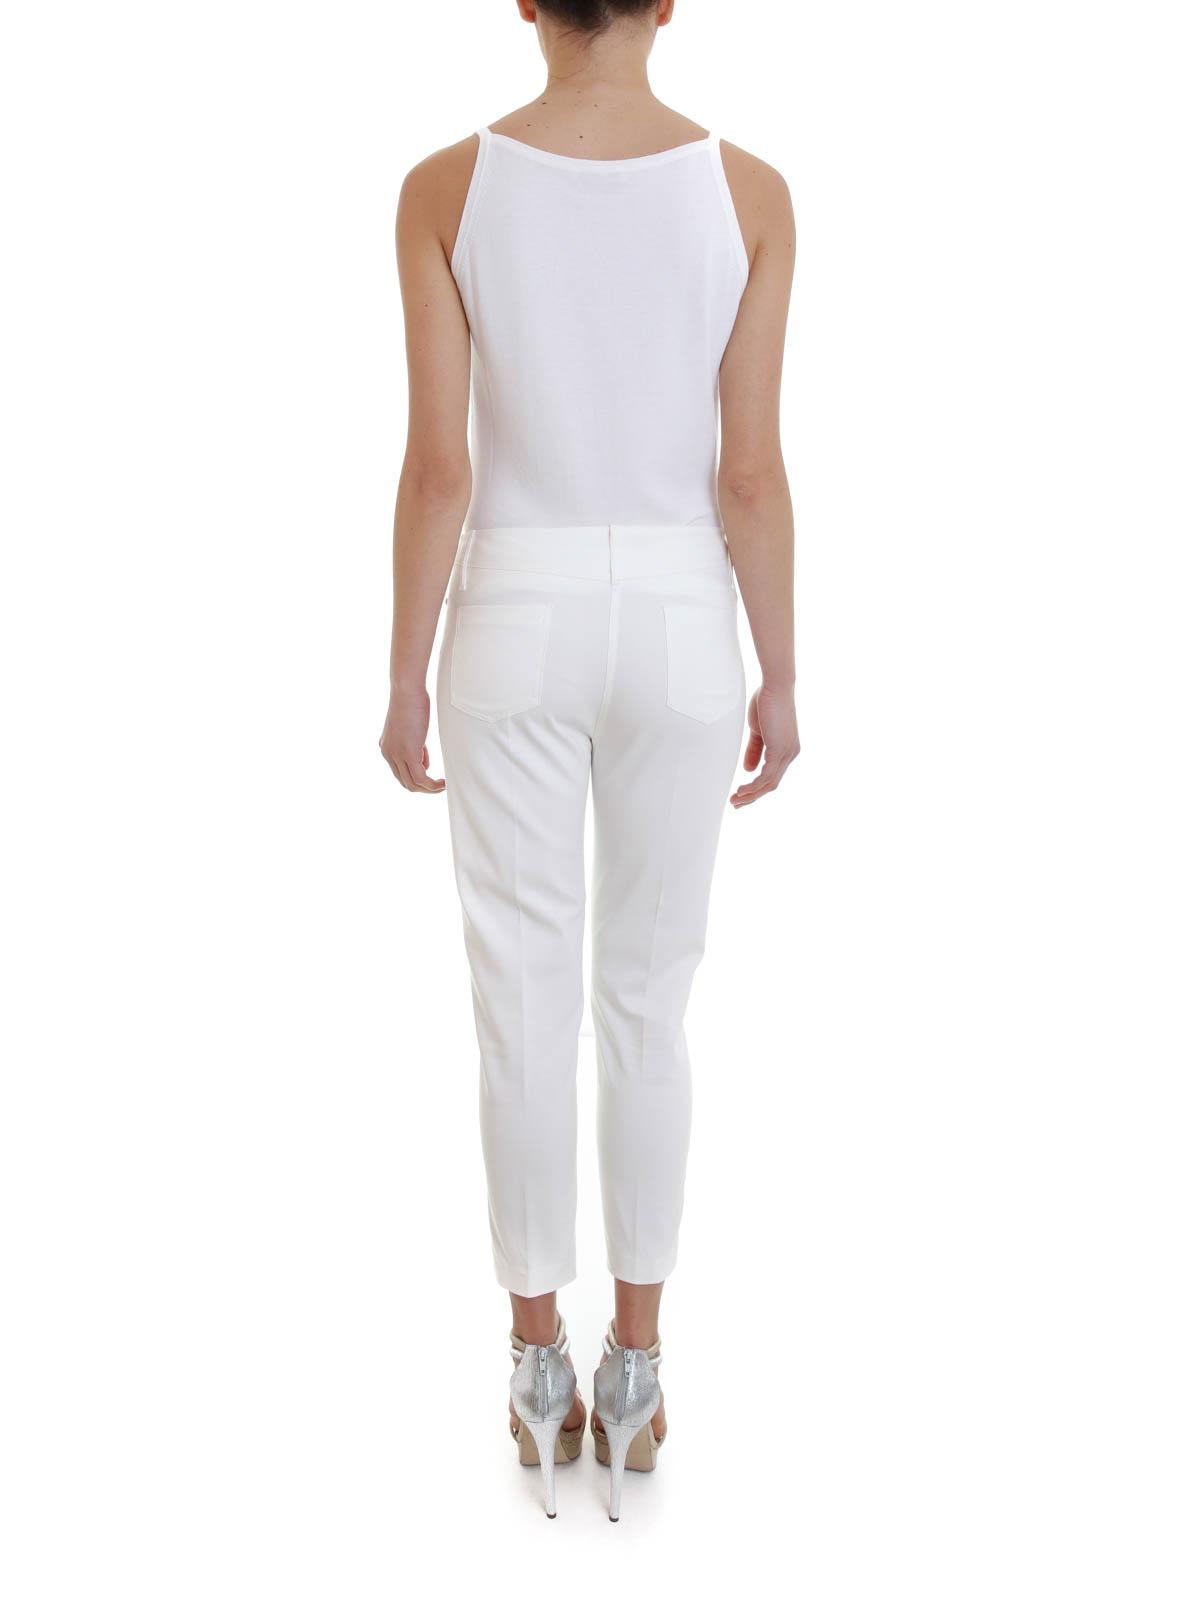 Pantalon Blanc Femme Pantalons Angelo Marani Casual Pour kuXZiOPT